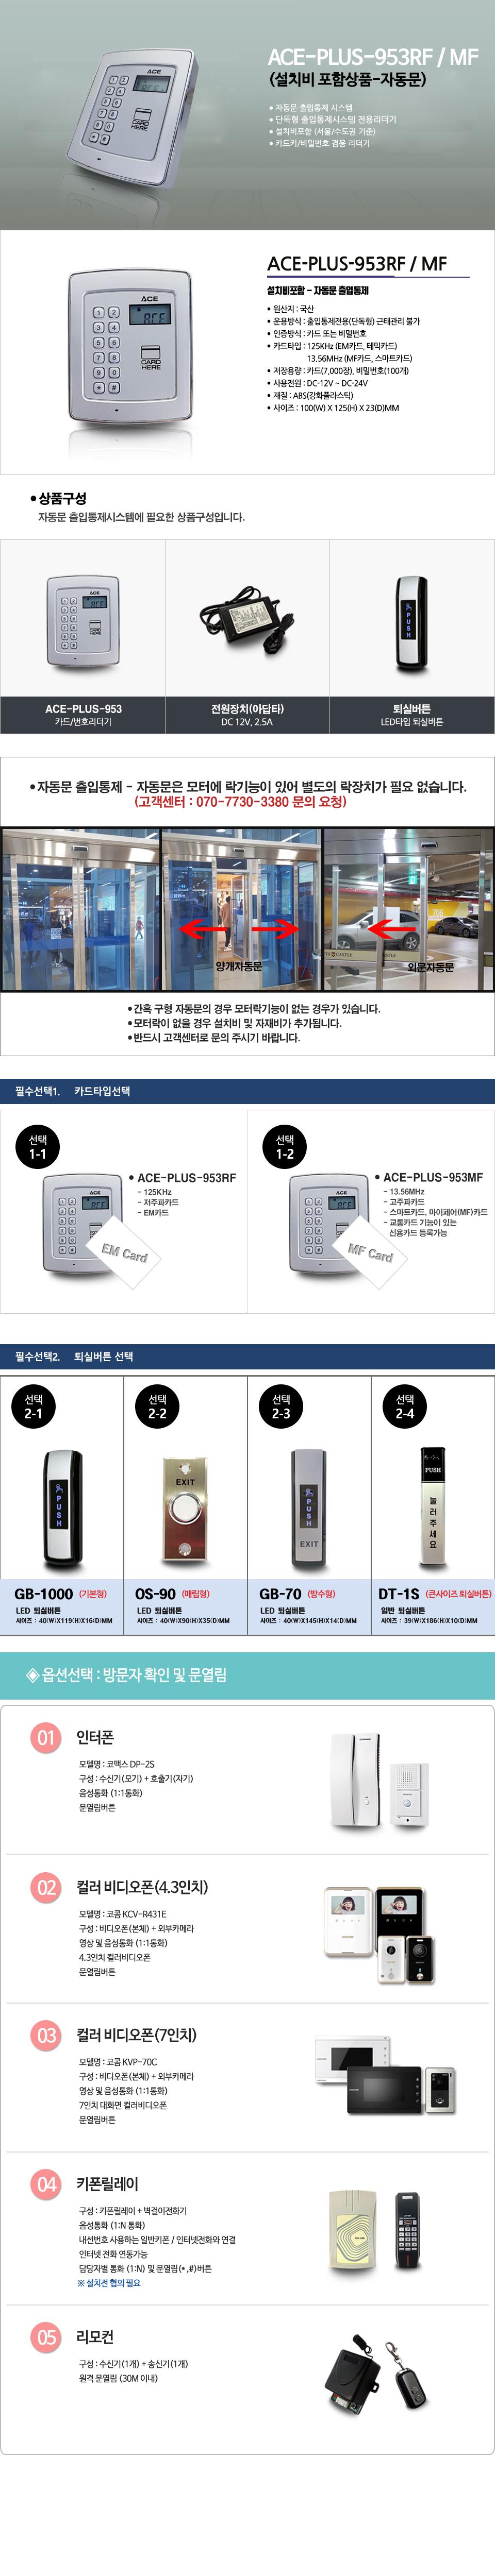 ACE-PLUS-953RF설치비포함작업-자동문.jpg